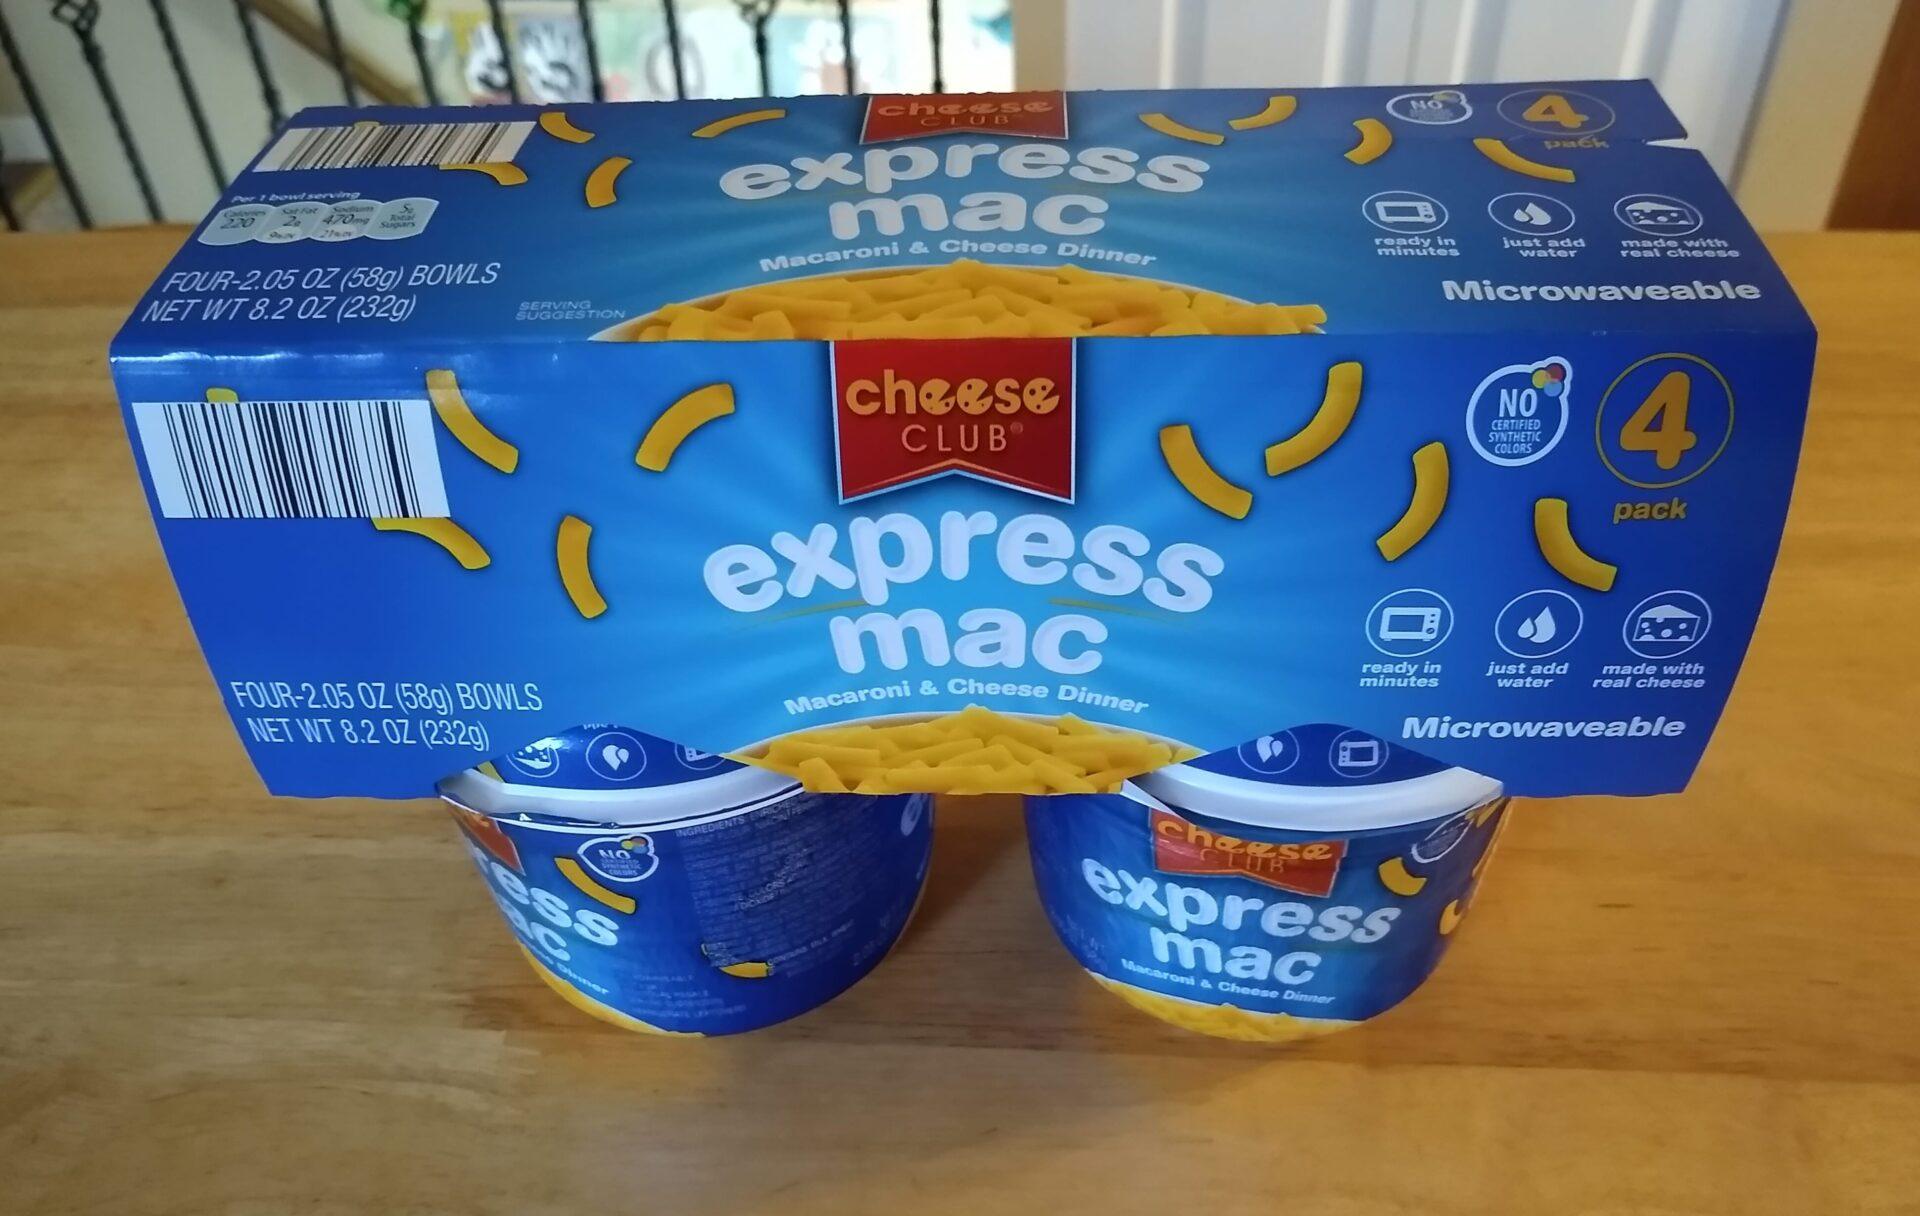 cheese club express mac macaroni and